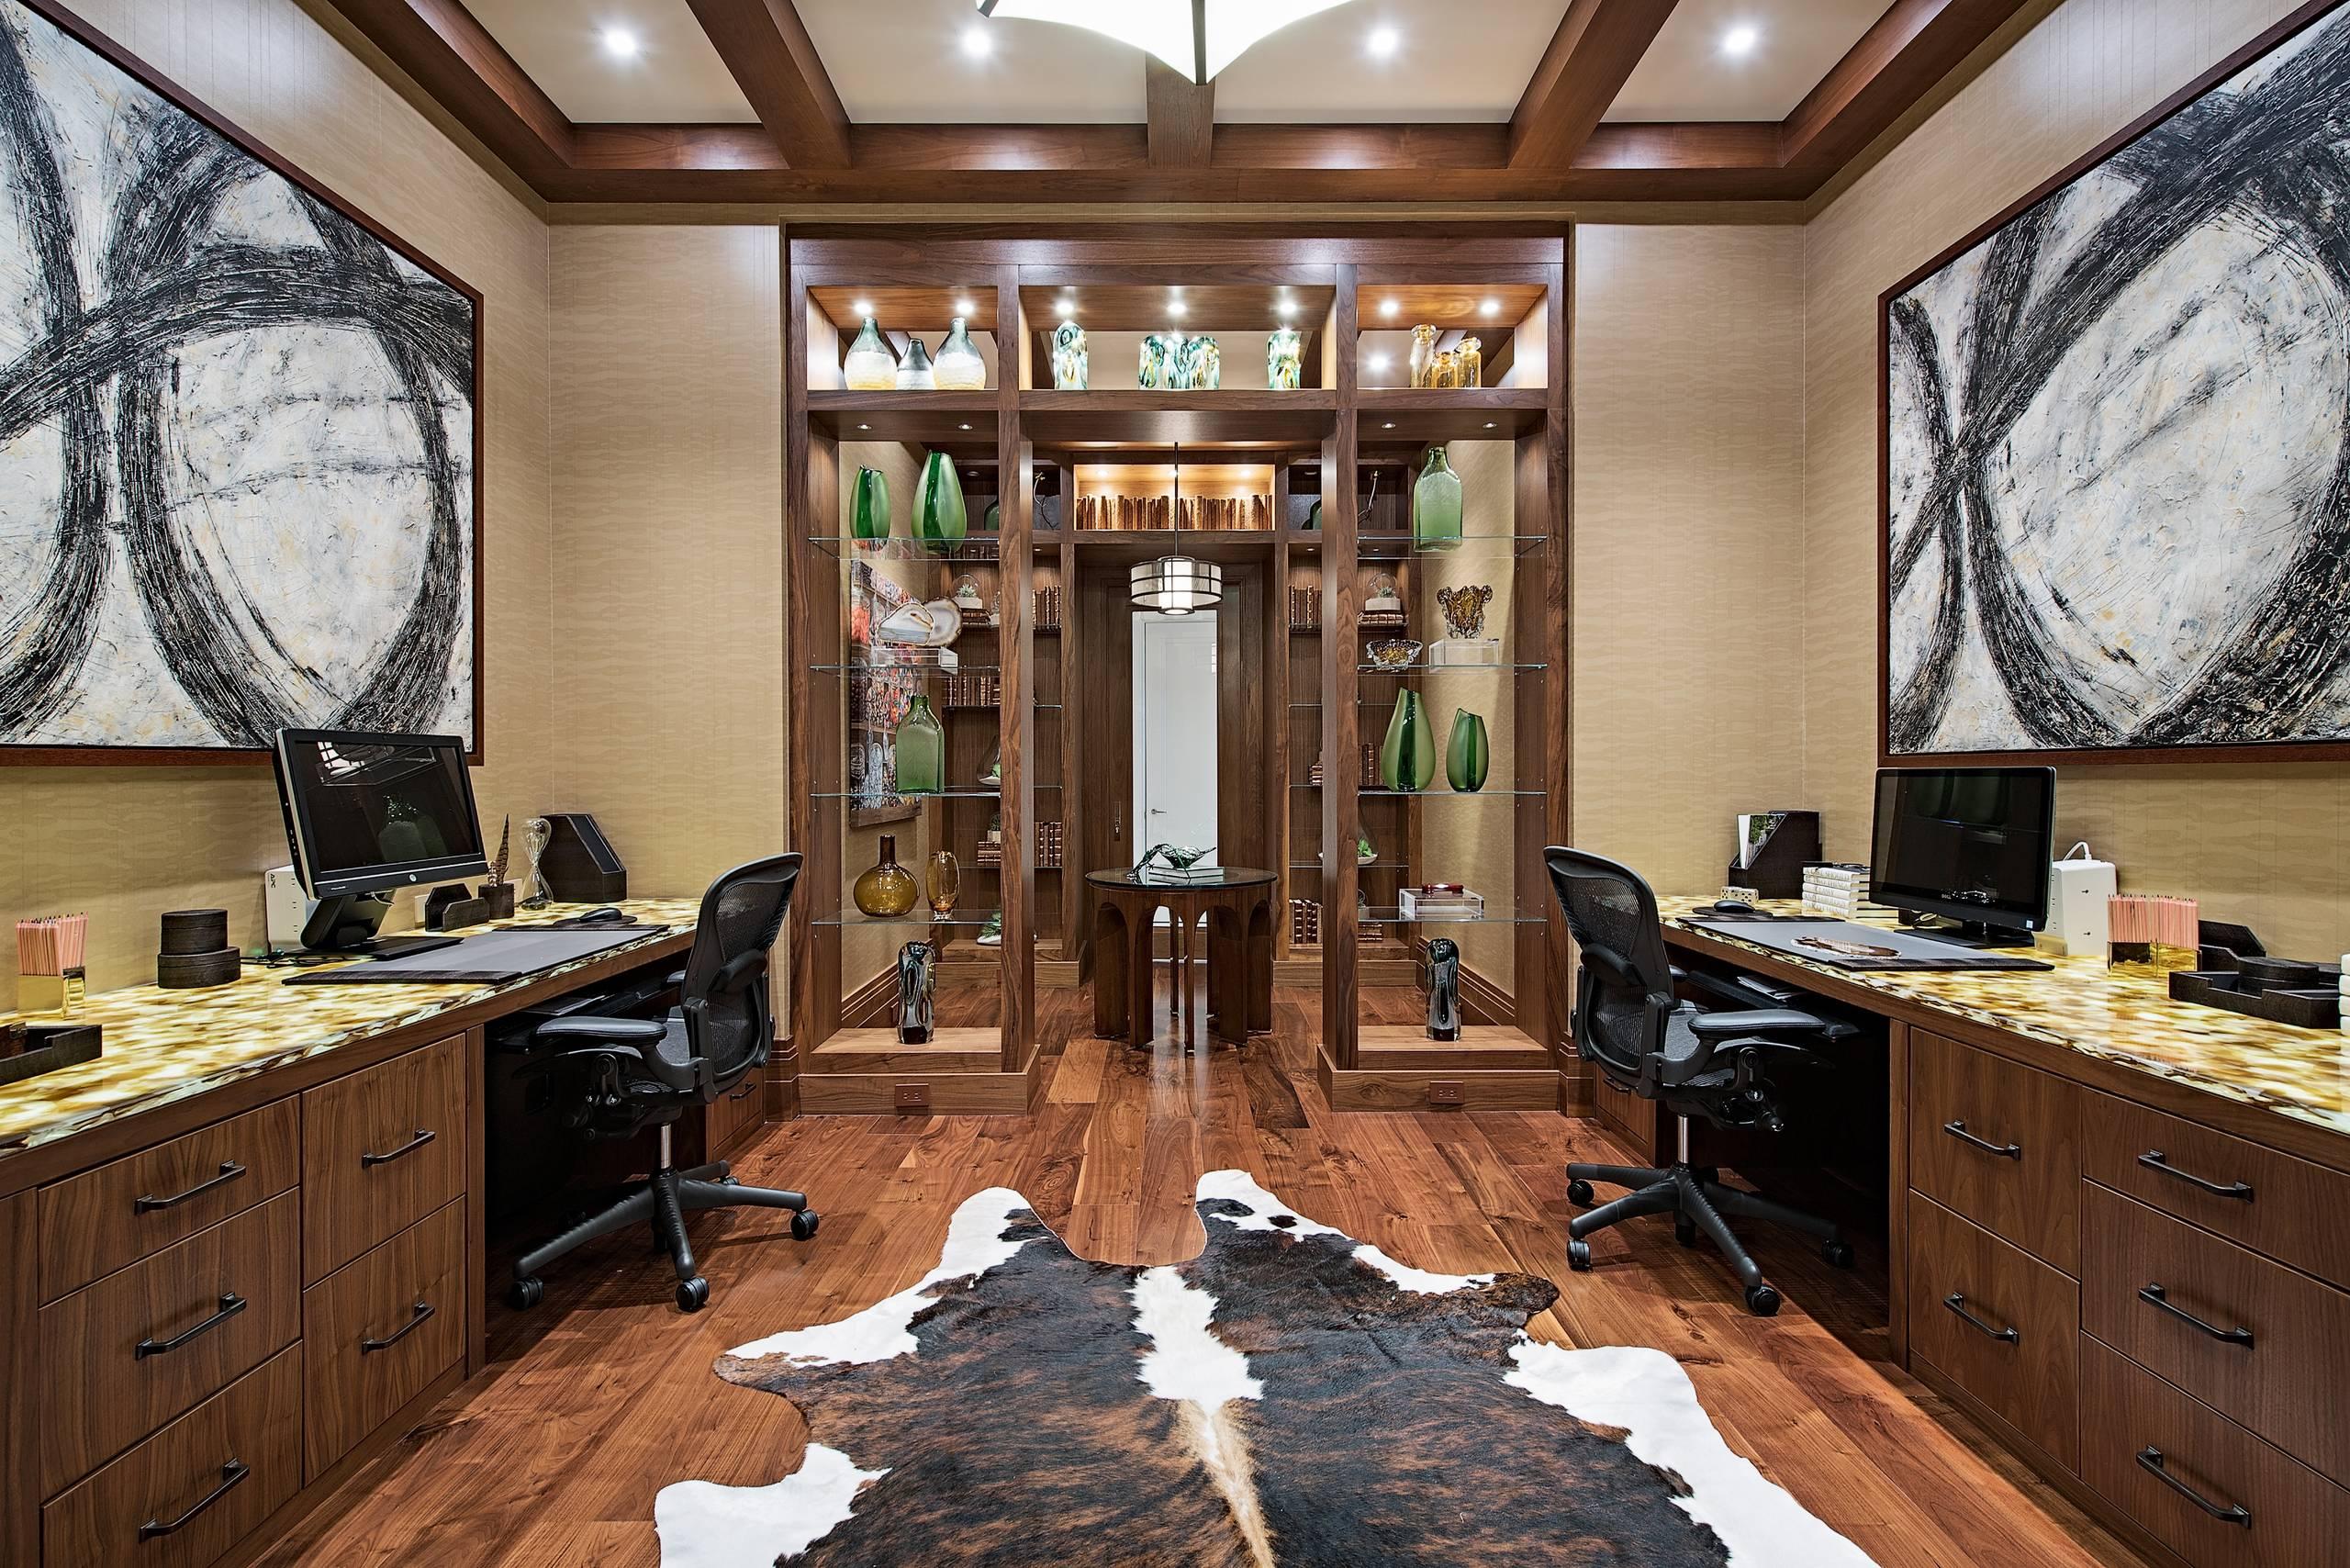 Certified Luxury Builders - 41 West - Veracruz Penthouse Remodel 2A